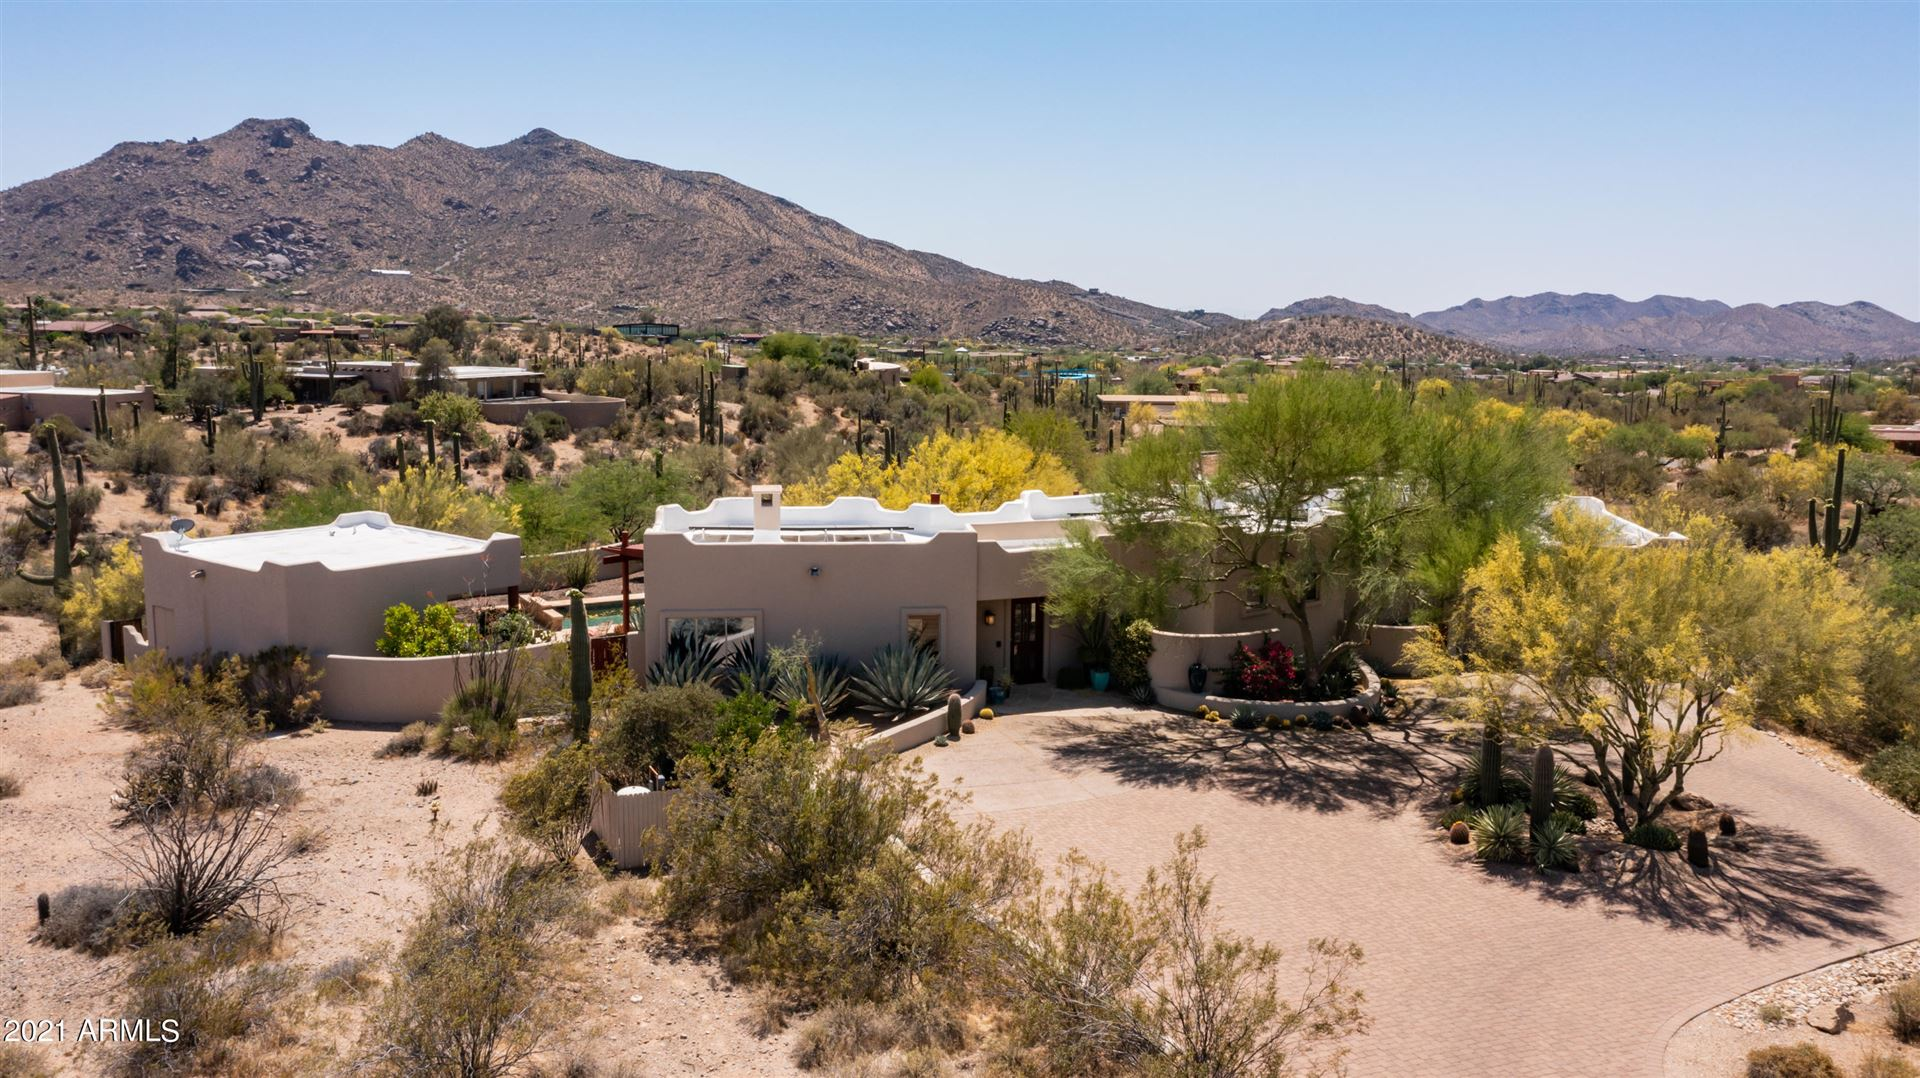 Photo of 7339 E STEVENS Road, Carefree, AZ 85377 (MLS # 6237704)